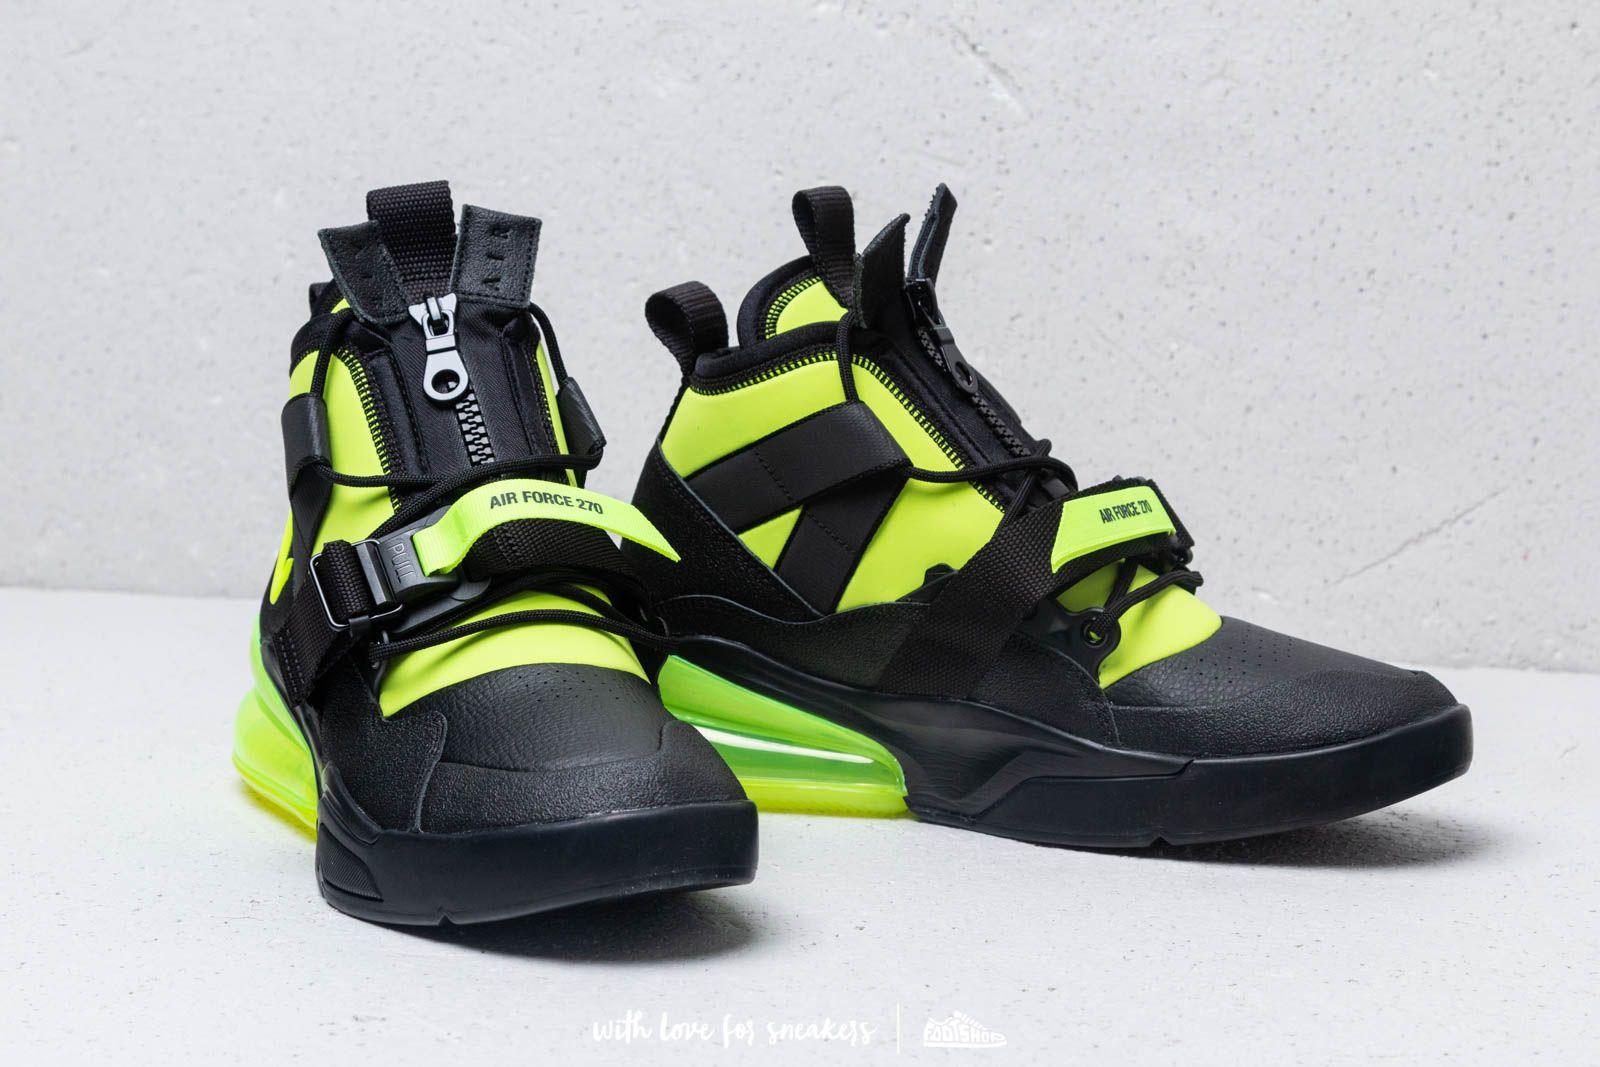 Nike Air Force 270 Utility Black Volt | Footshop